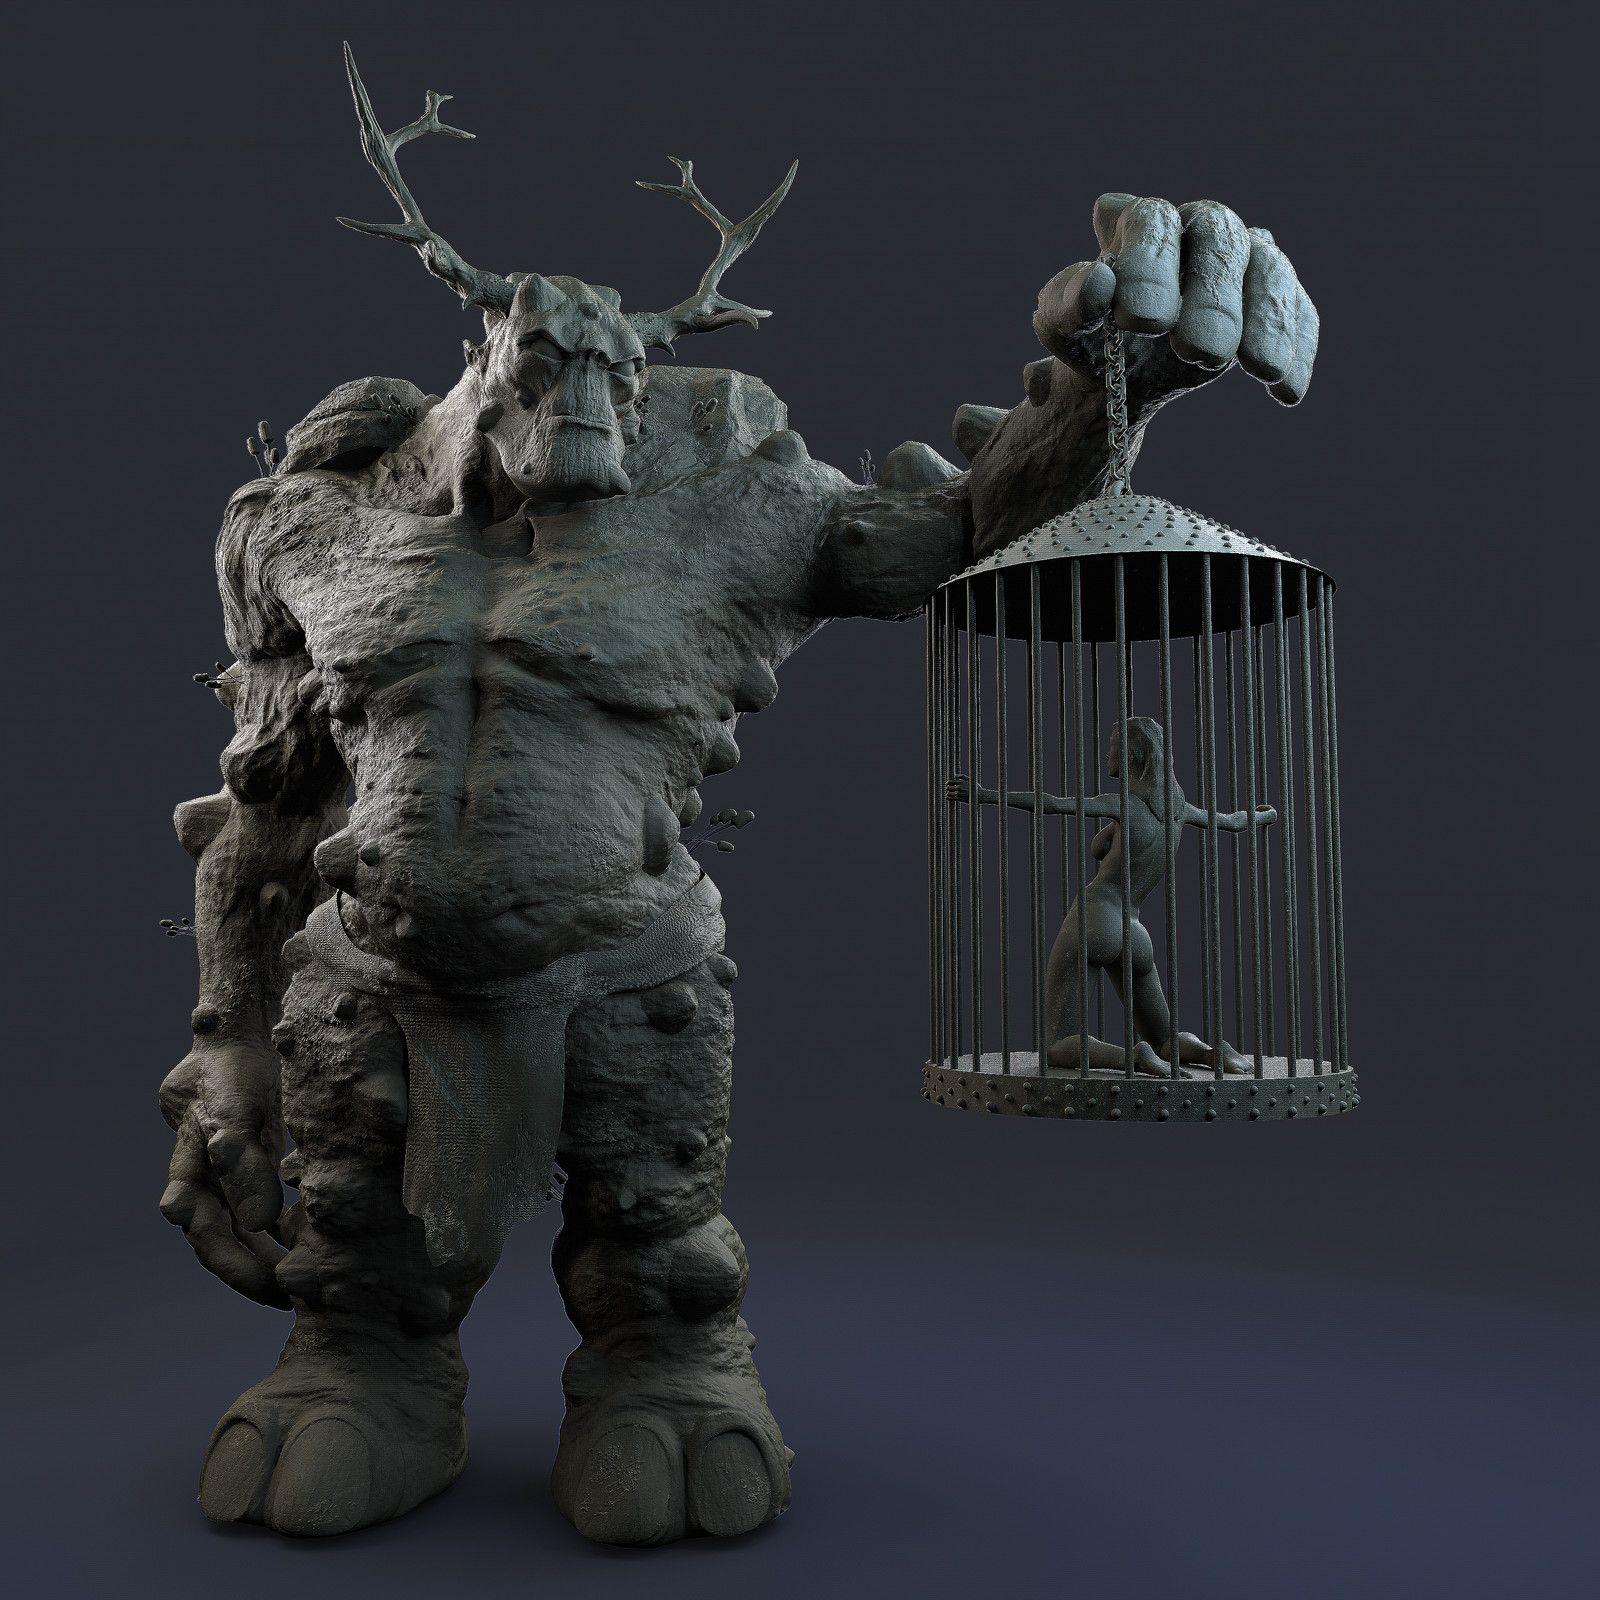 Troll, Grigory Rudenko on ArtStation at https://www.artstation.com/artwork/q2lxy